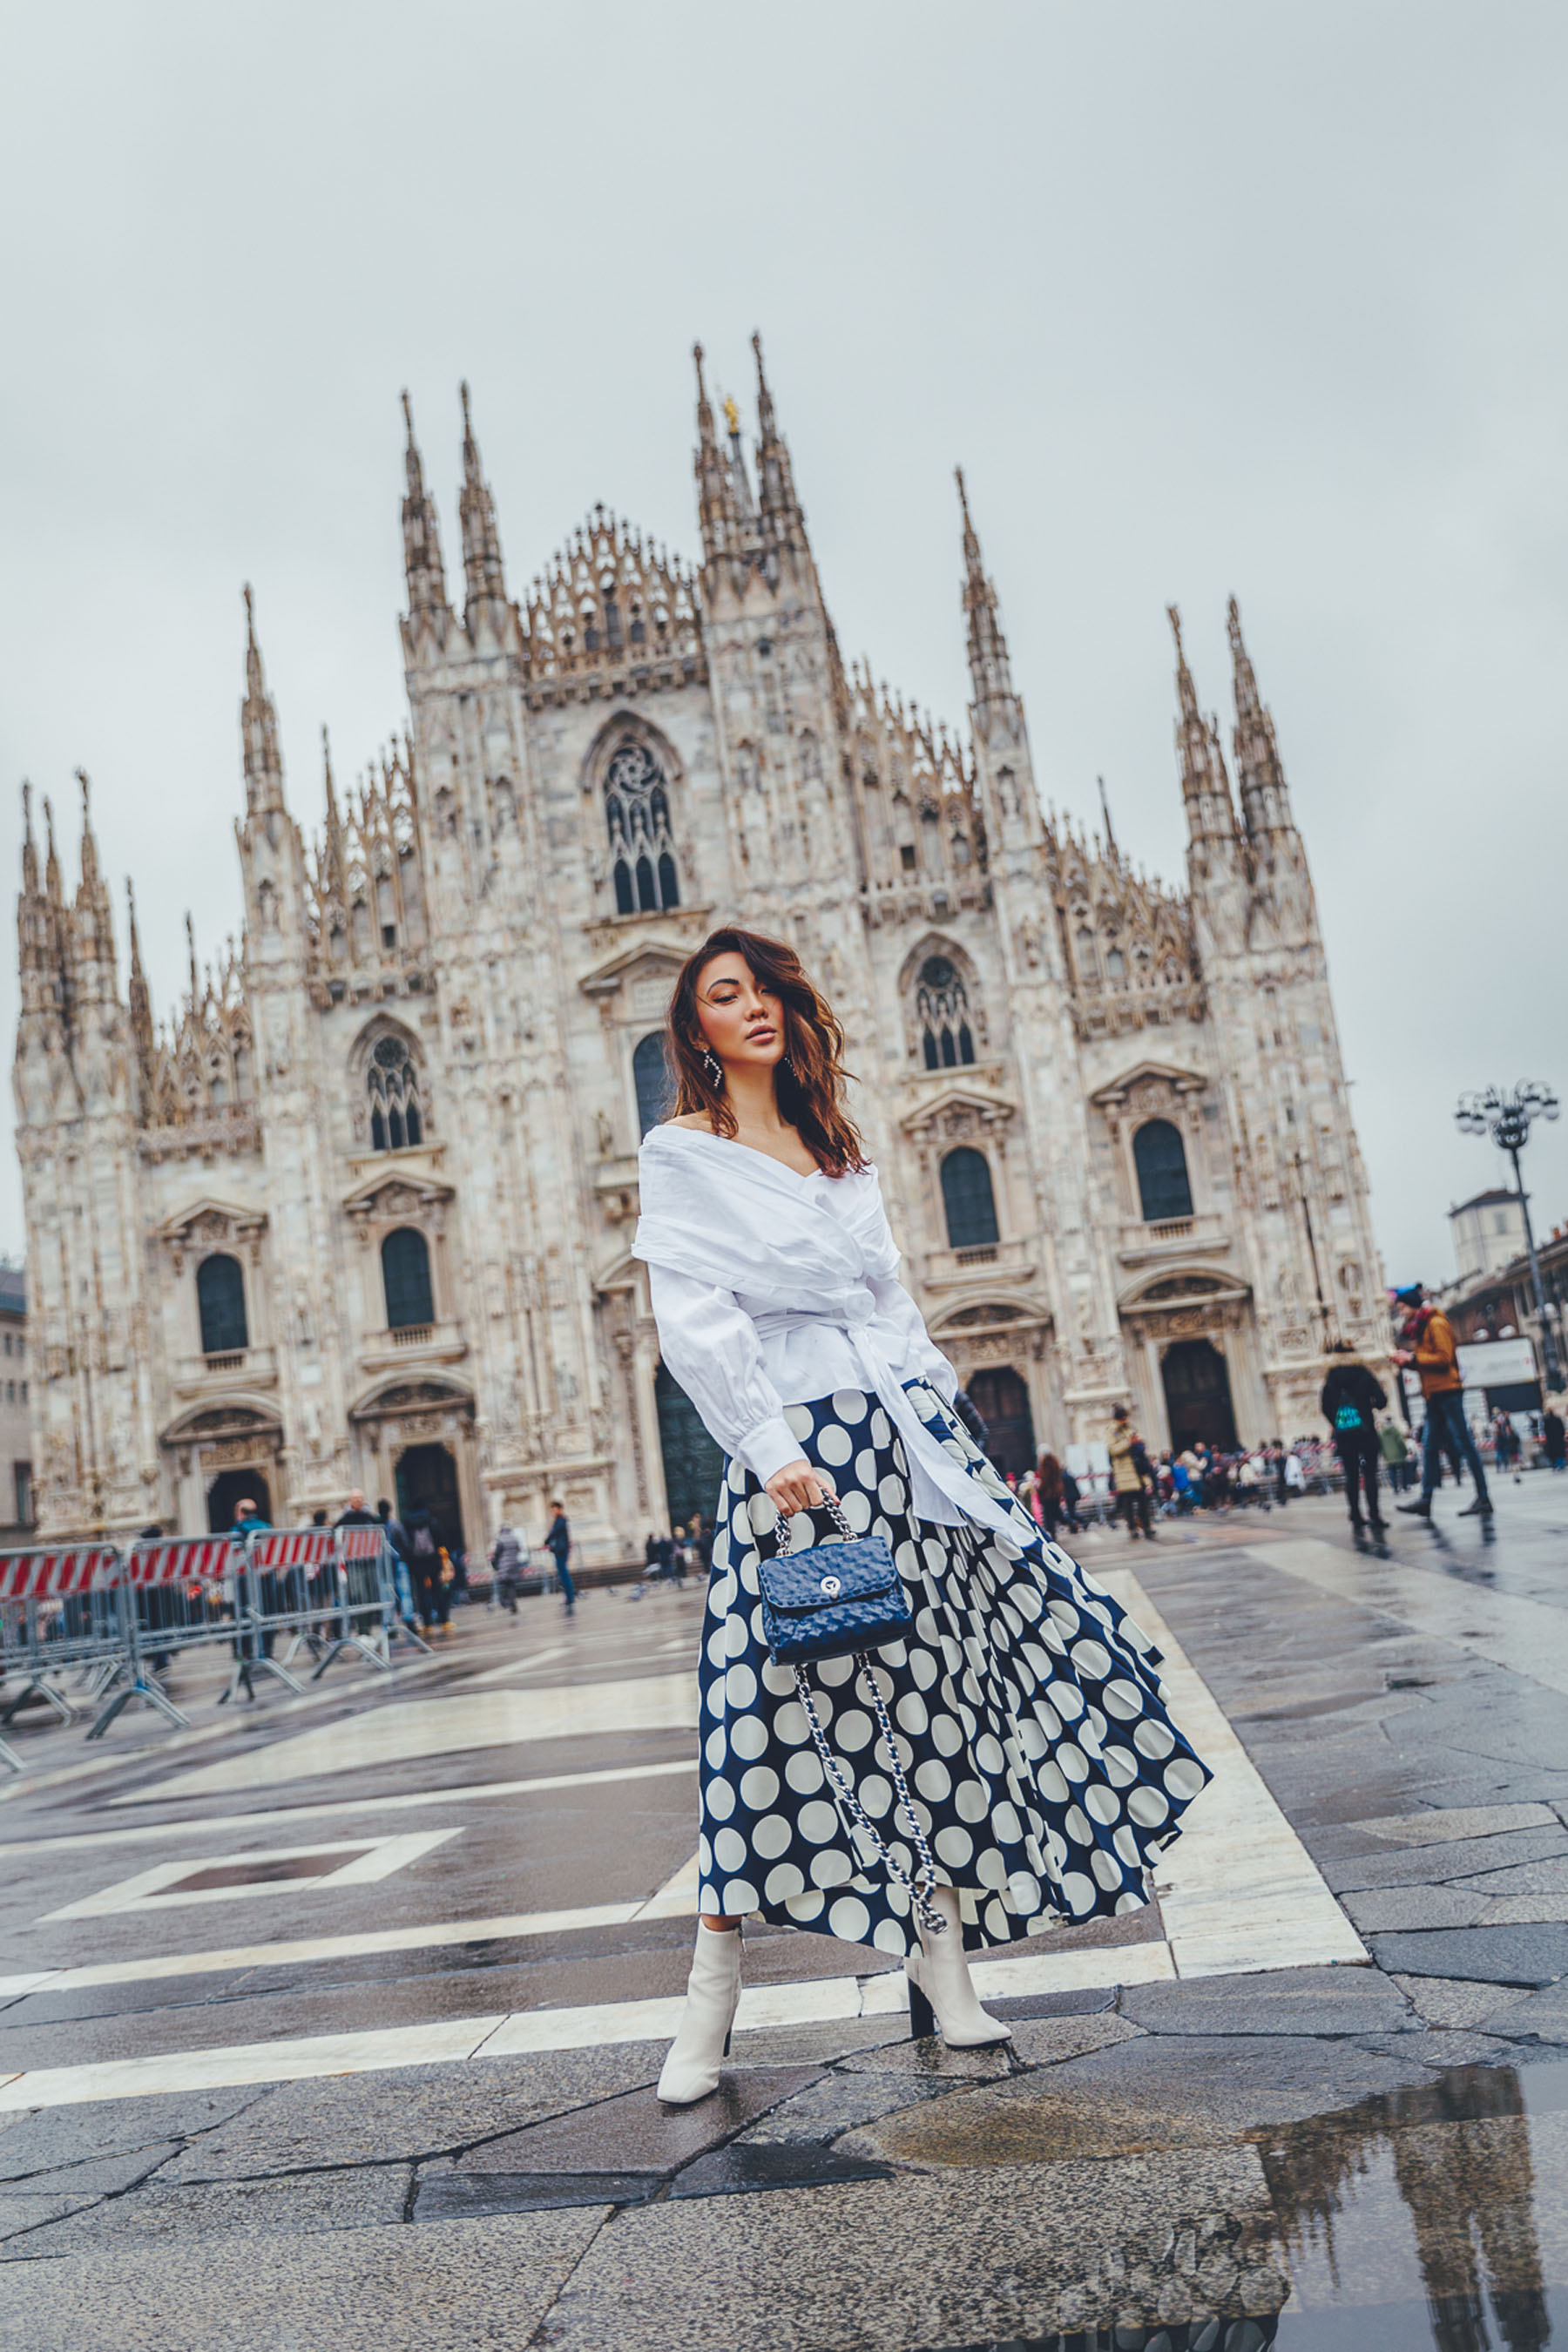 2018 Fashion Trends - Polka Dot Skirt, White Boots, Wrap Top // Notjessfashion.com